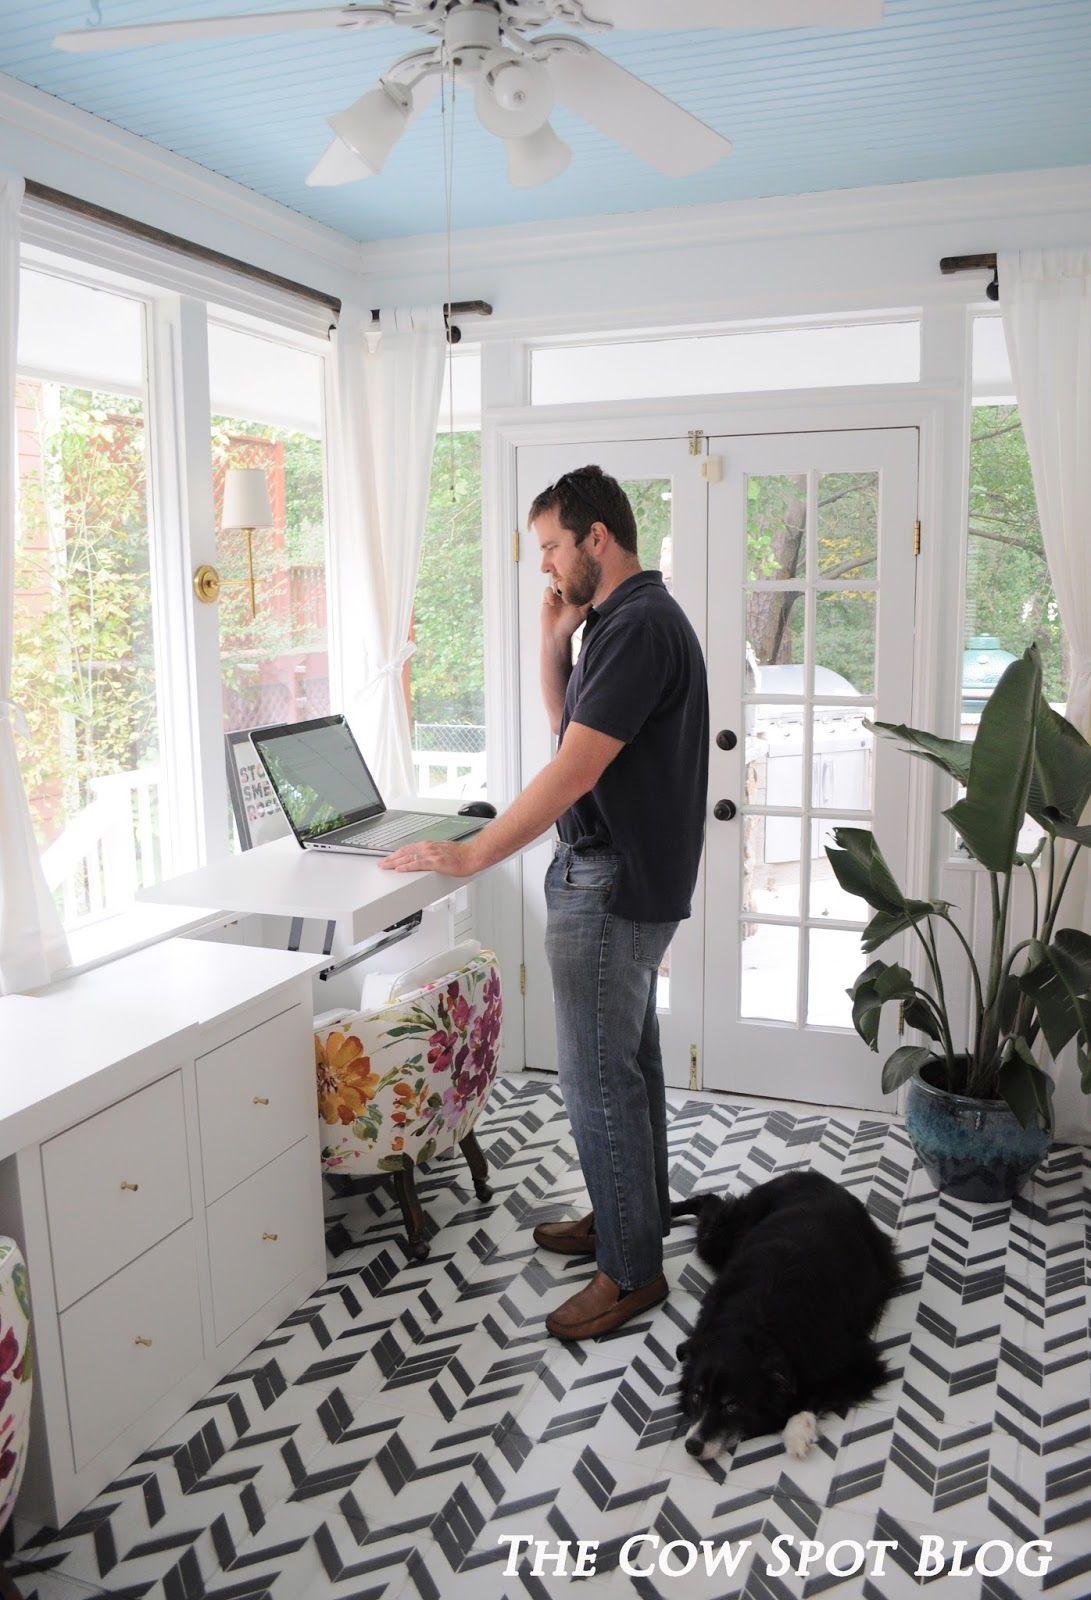 Inspiring Home Office Decor Ideas for Her  Small room design